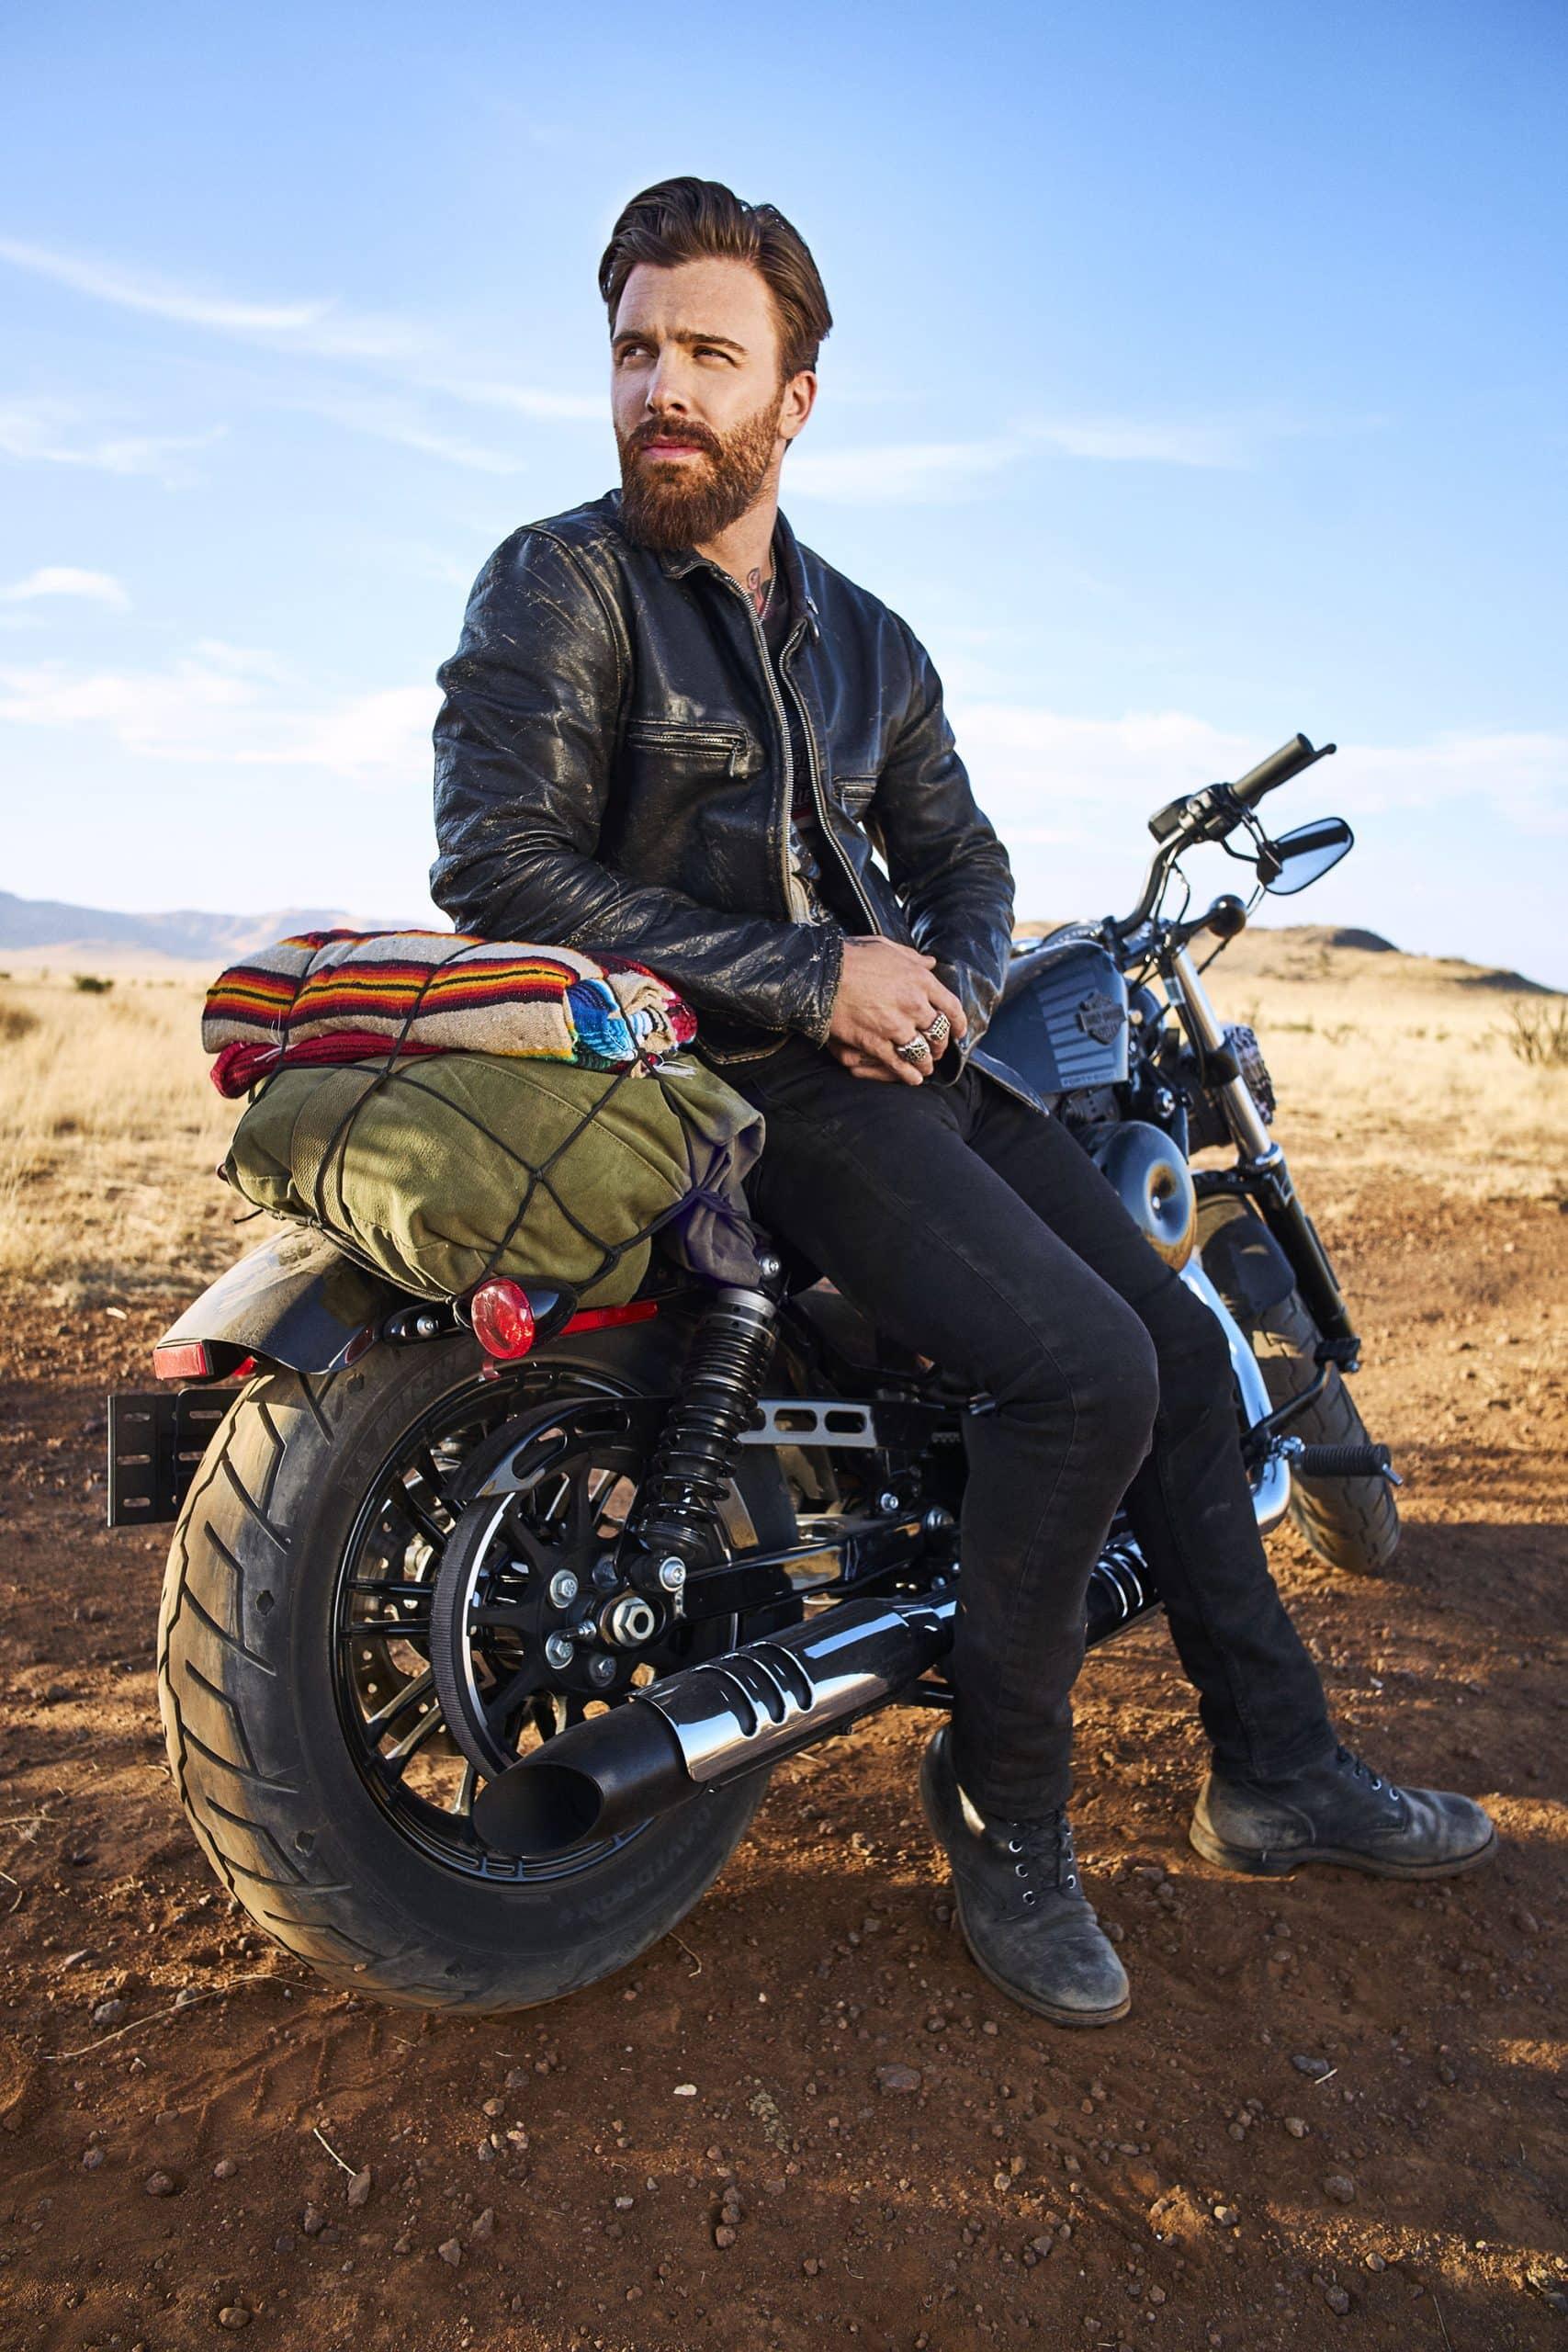 American Crew Harley Davidson 19 scaled